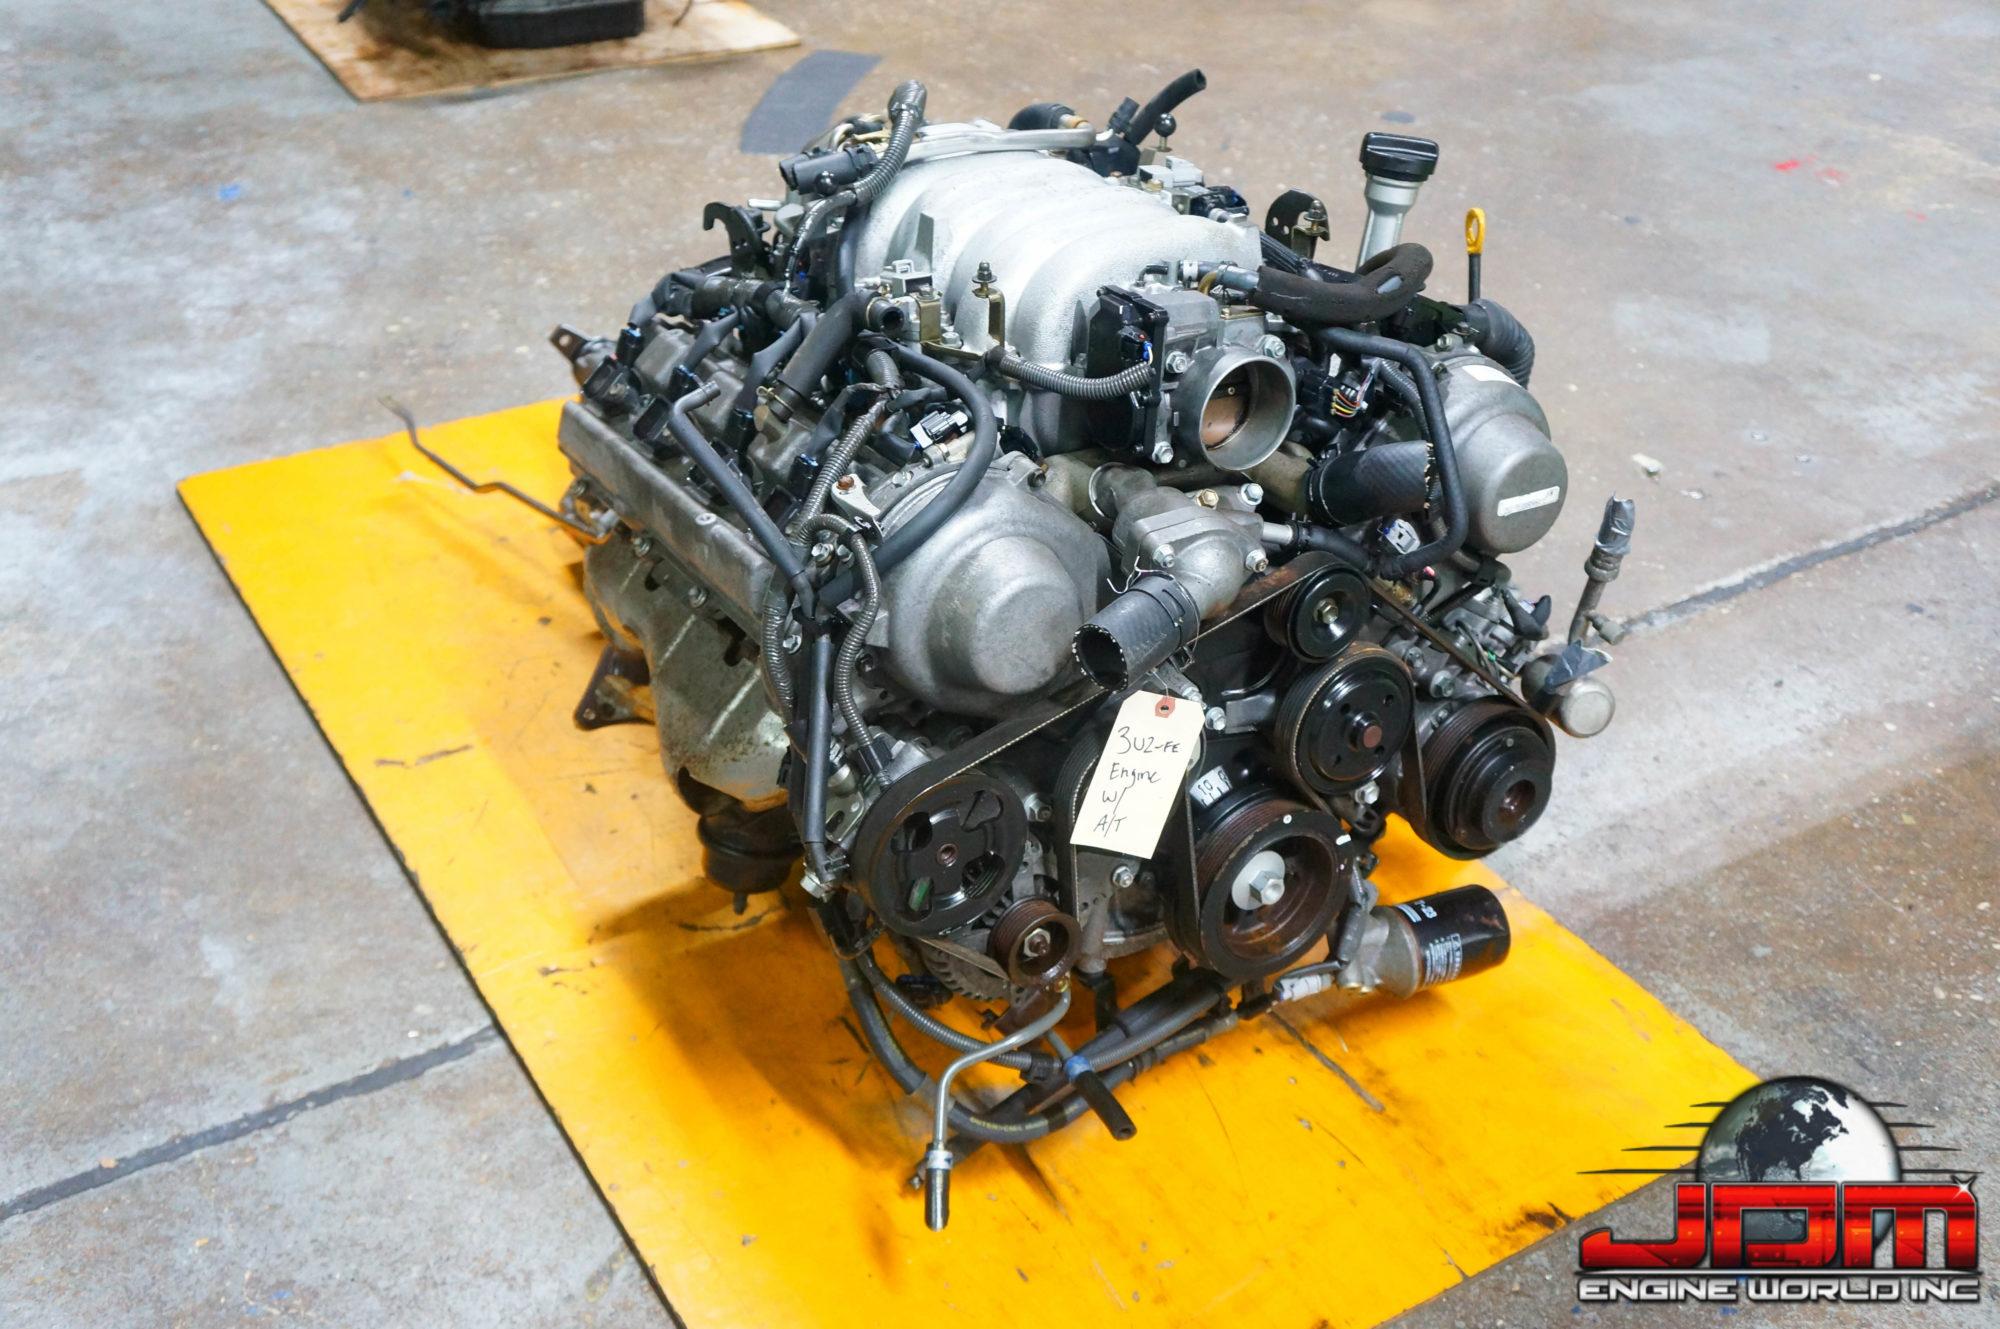 LEXUS GS430 LS430 SC430 3UZ-FE ENGINE & AUTOMATIC TRANSMISSION VVTi 4.3L V8 JDM 3UZ